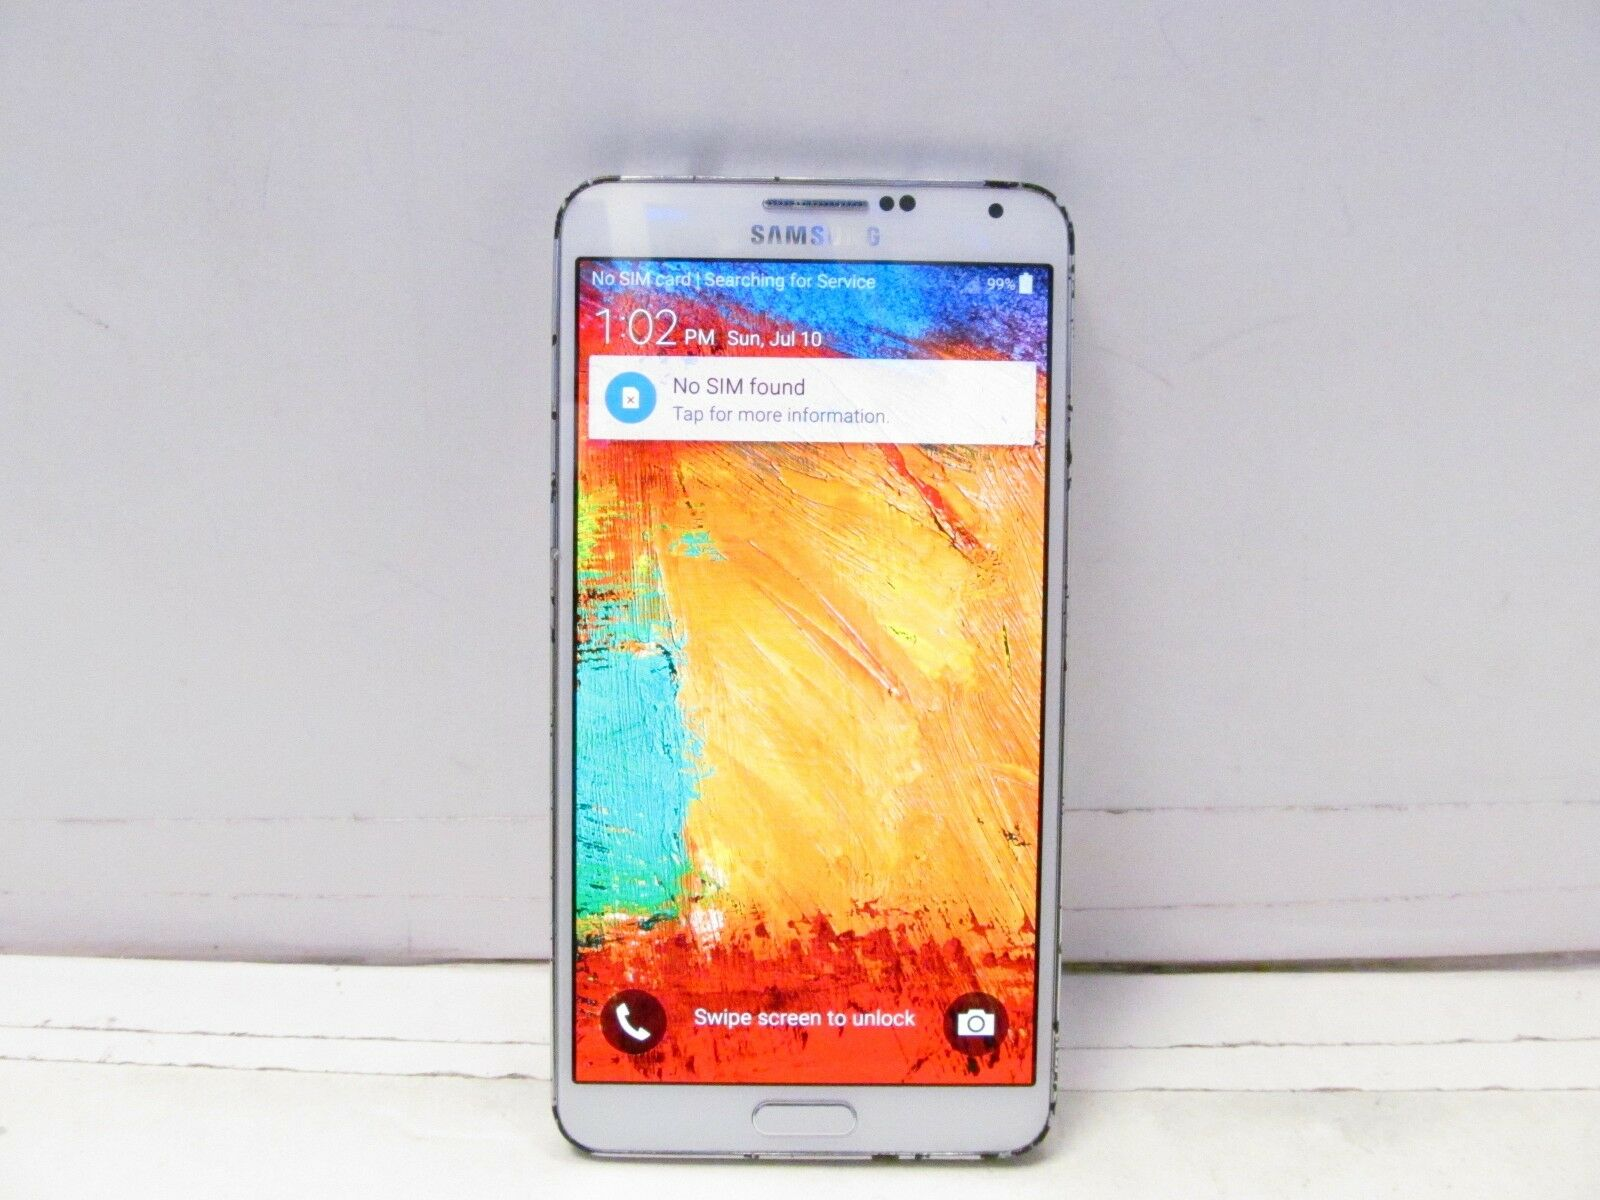 Samsung Galaxy Note 3 SM-N900V - 32GB - White (Verizon)  ***BAD ESN***  READ